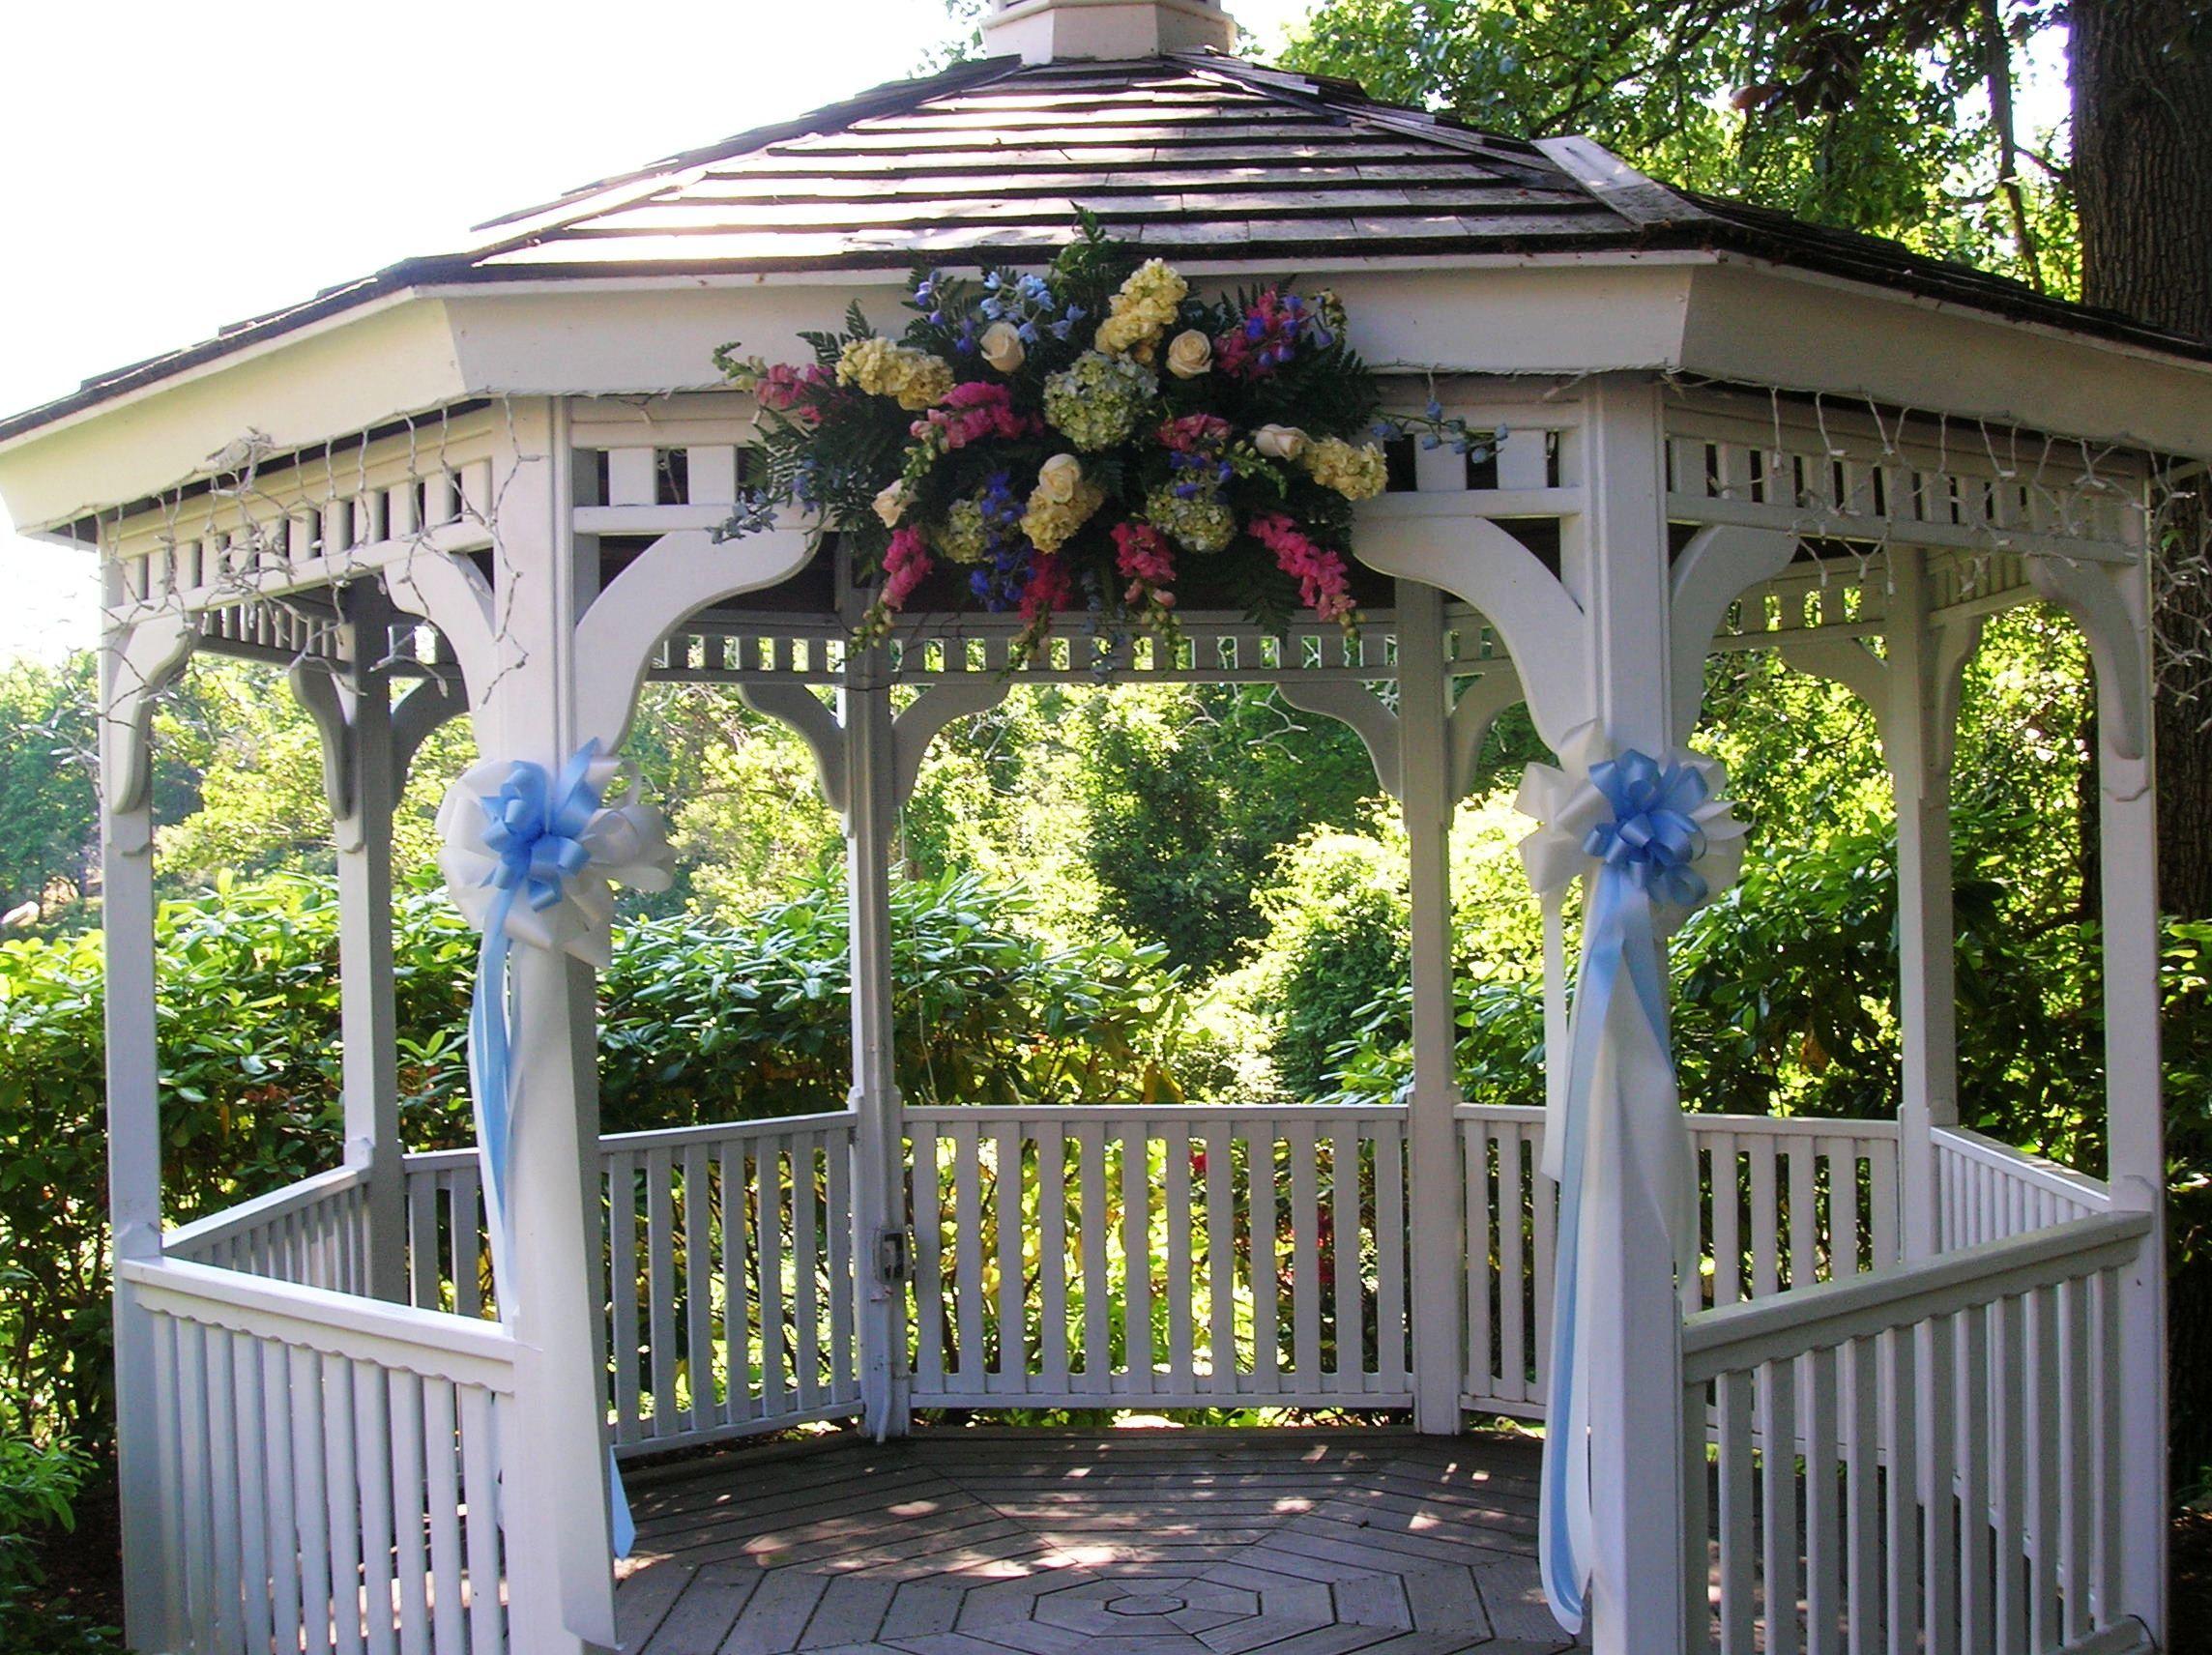 Outdoor weddings wedding gazebo decorating ideas outdoor for Outdoor wedding gazebo decorating ideas